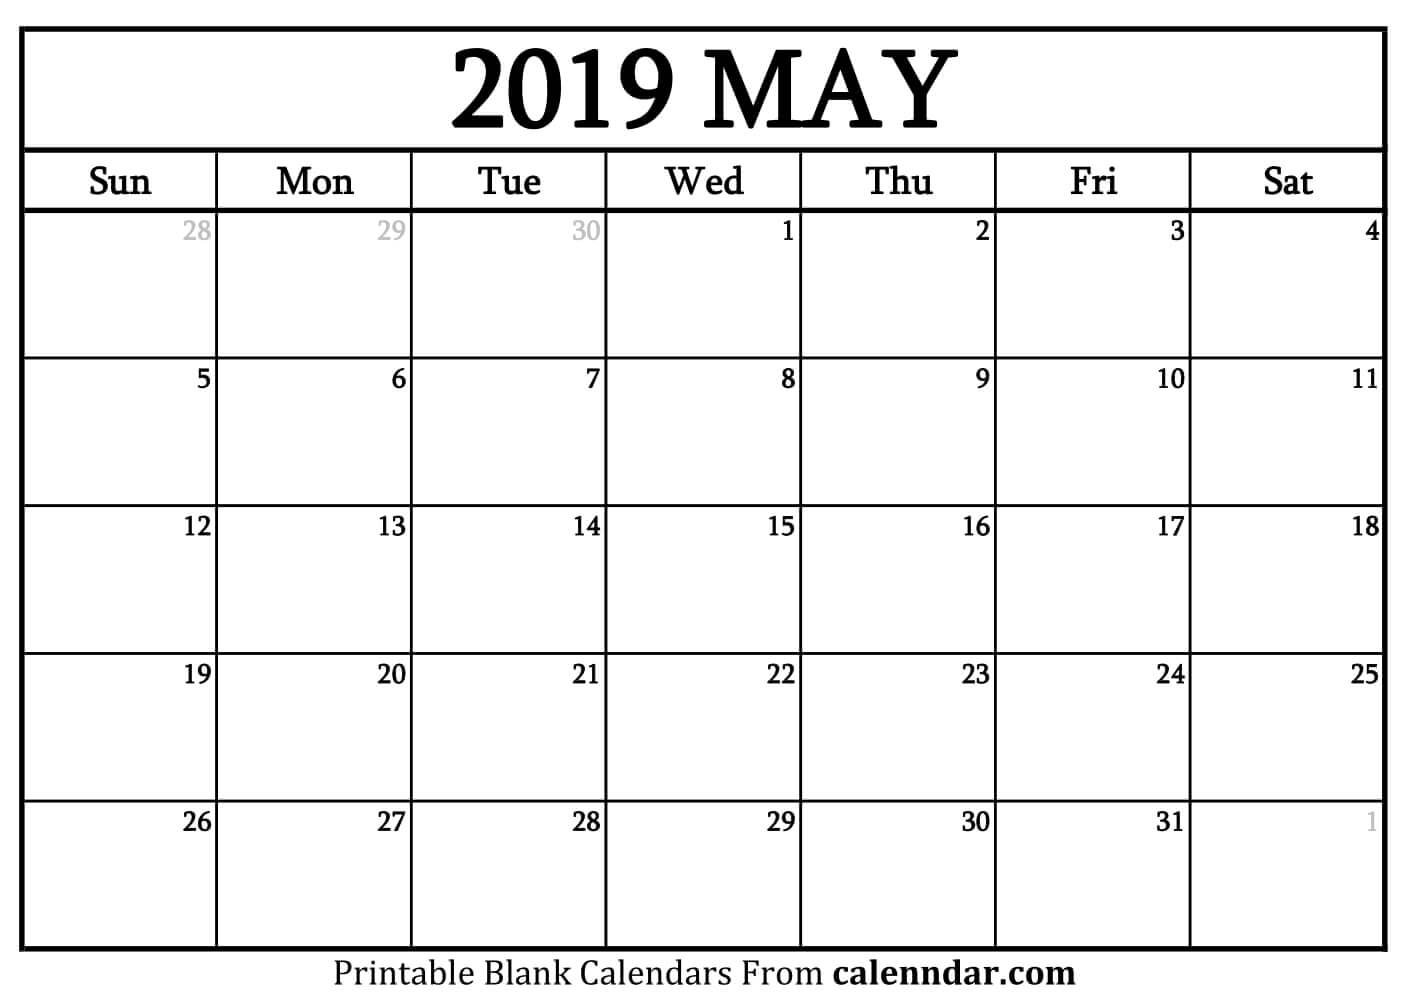 Blank May 2019 Calendar Templates - Calenndar Calendar 2019 May